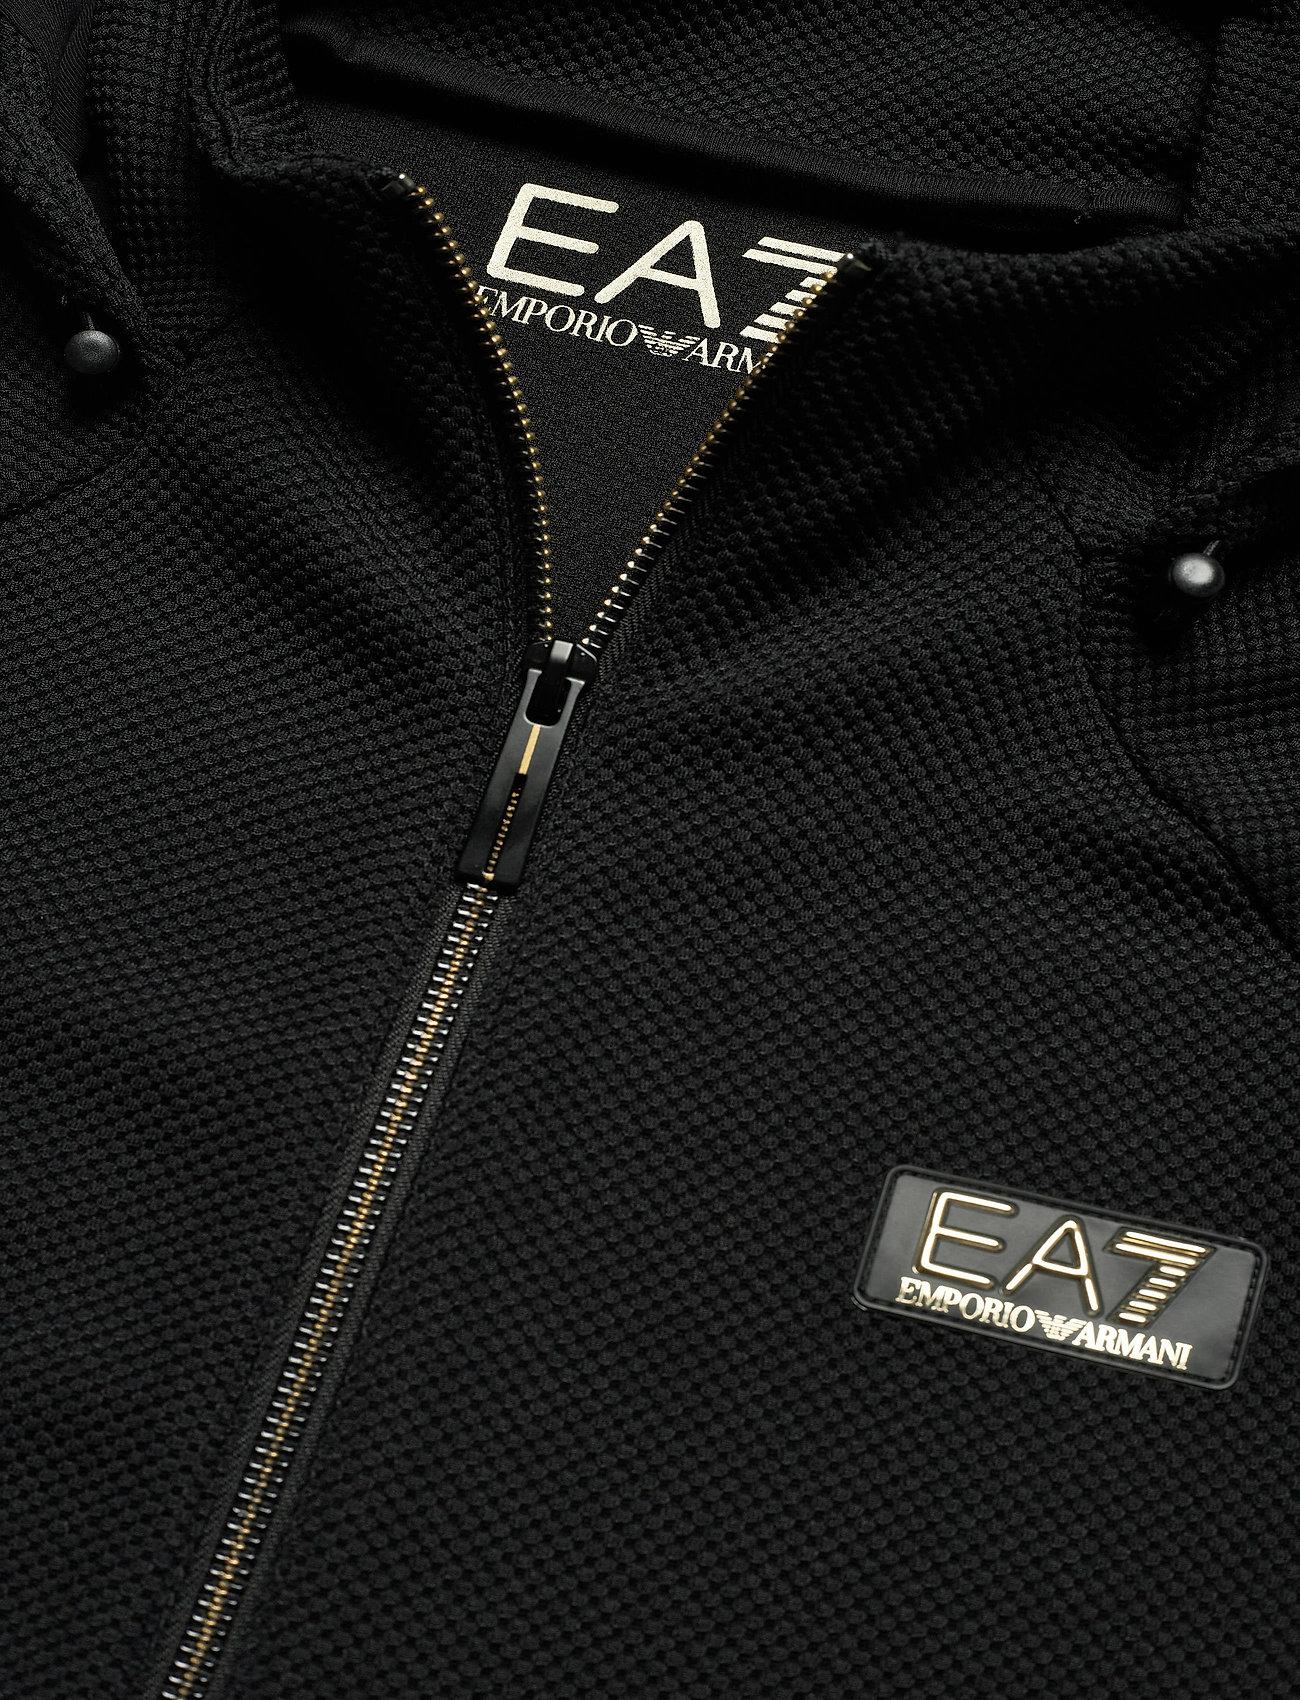 EA7 SWEATSHIRT - Sweatshirts BLACK - Menn Klær